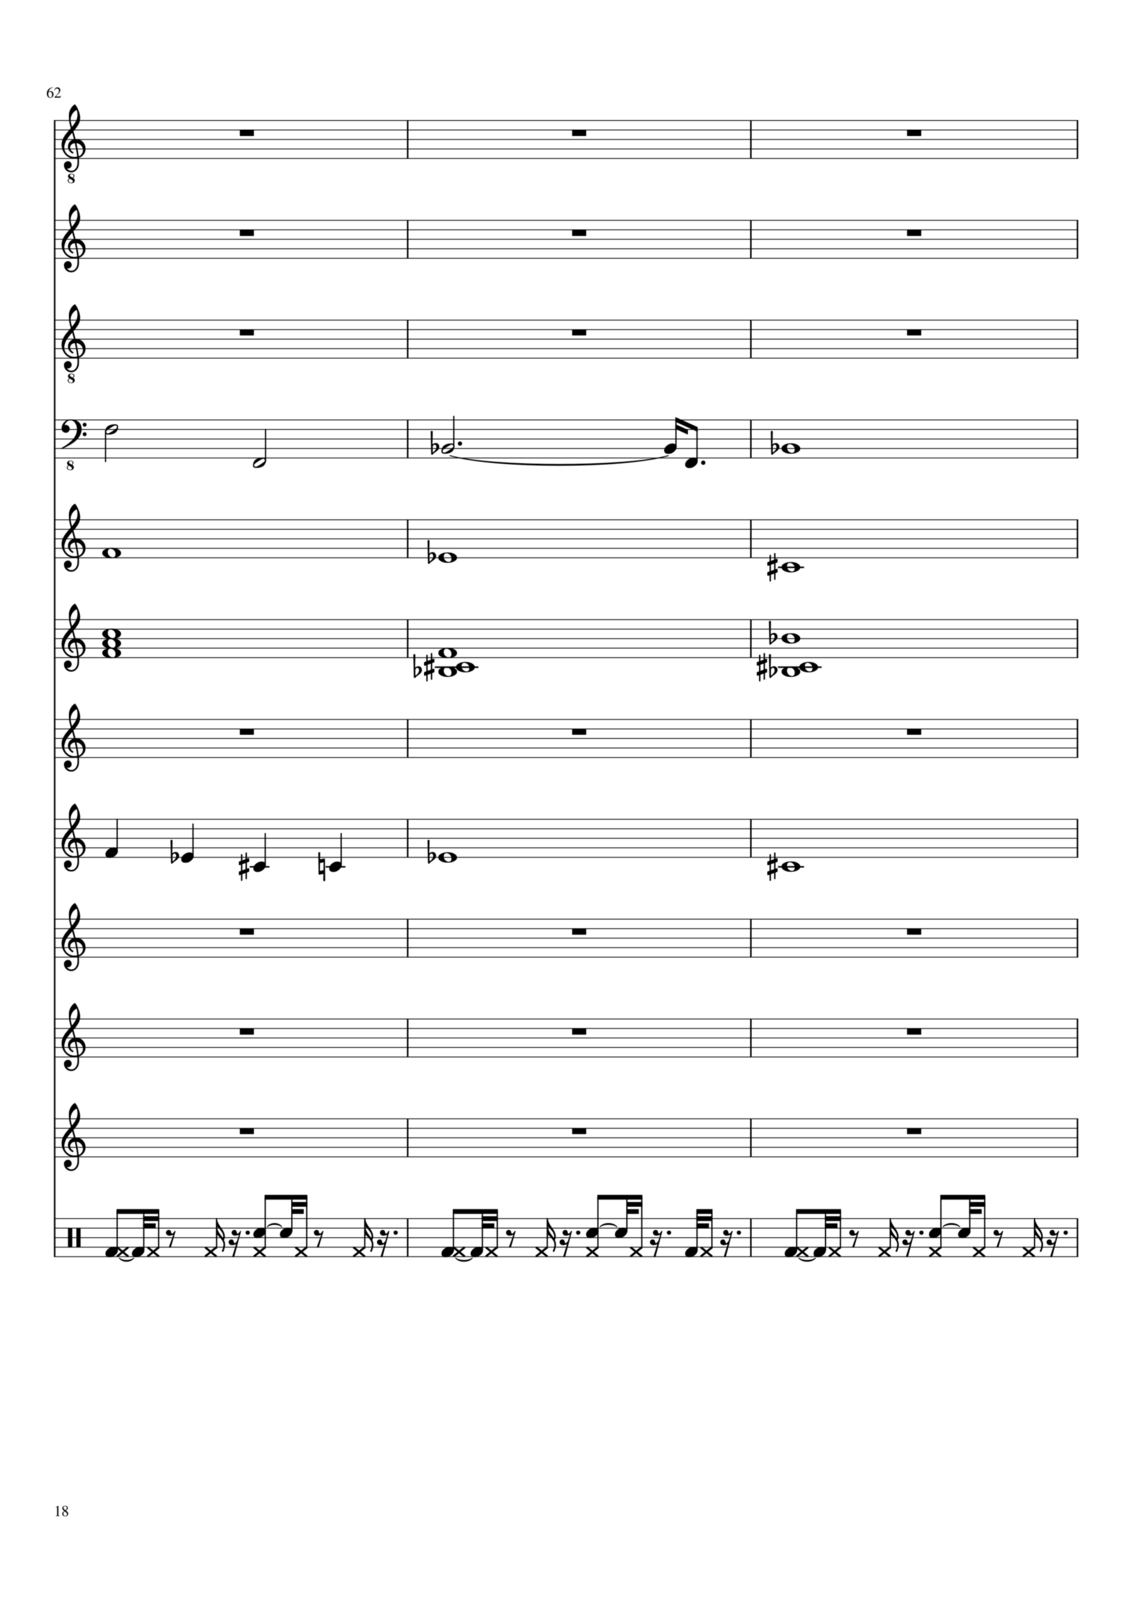 Prosti slide, Image 18